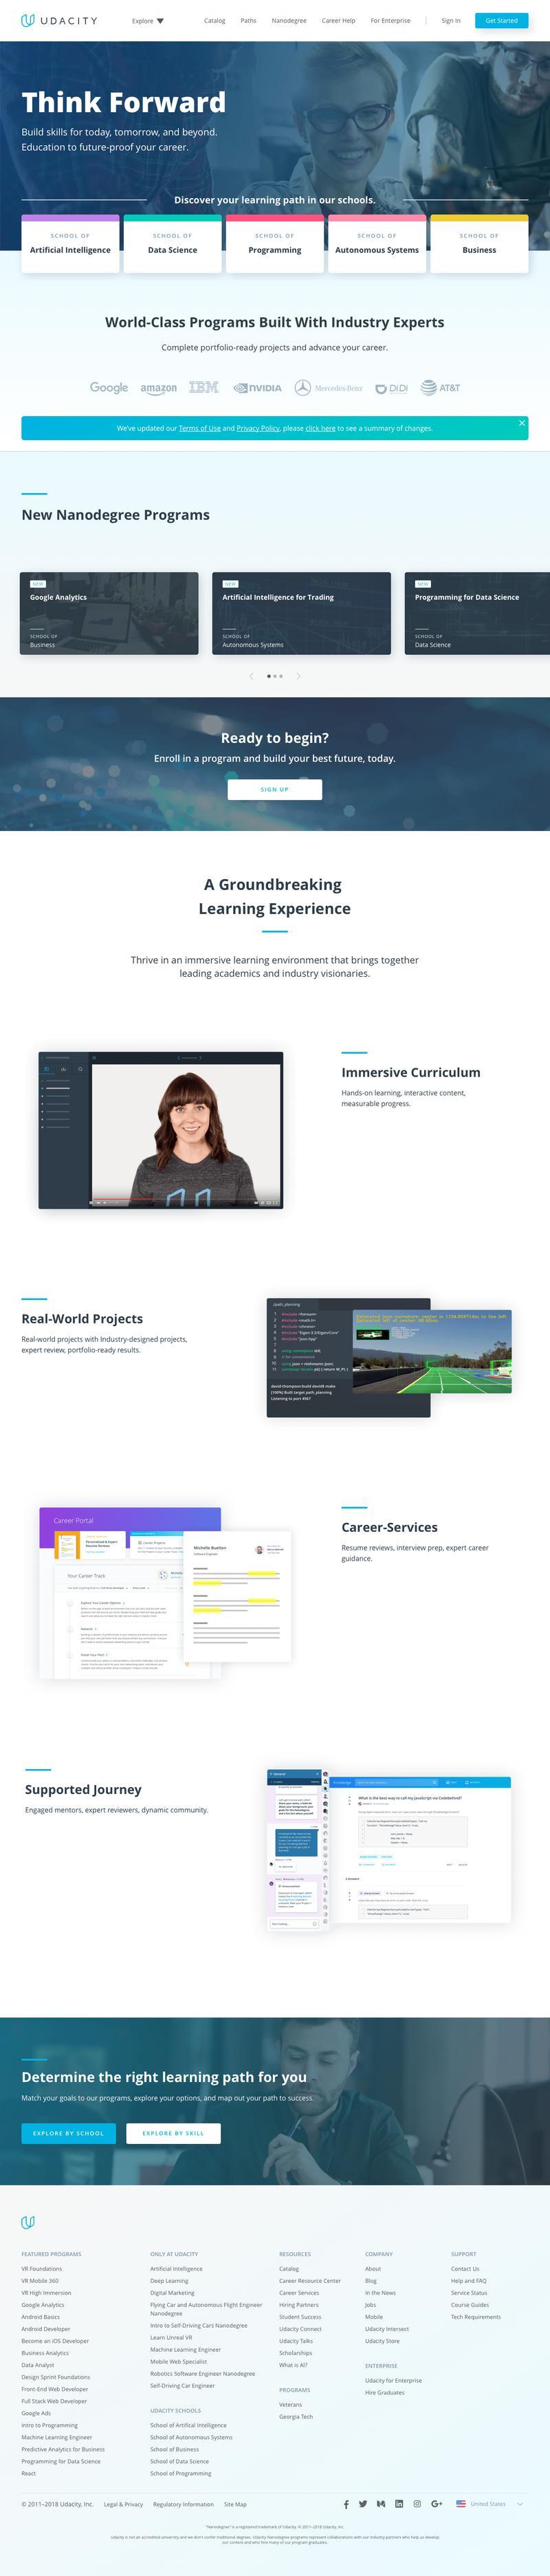 Web Design Timeline | A page on udacity com | Crayon